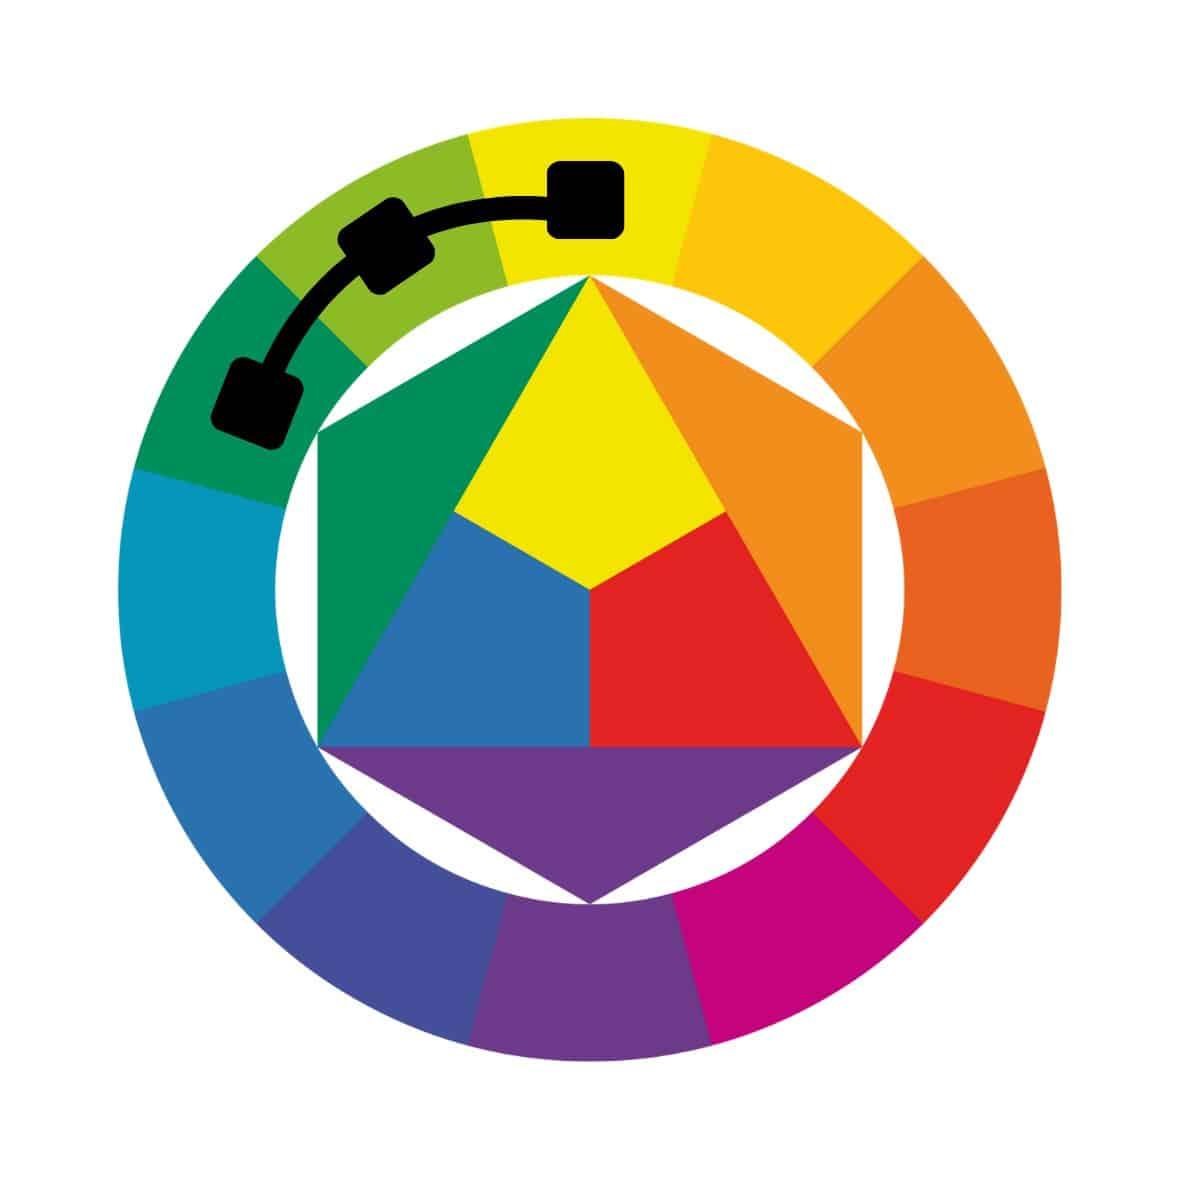 analogous scheme color